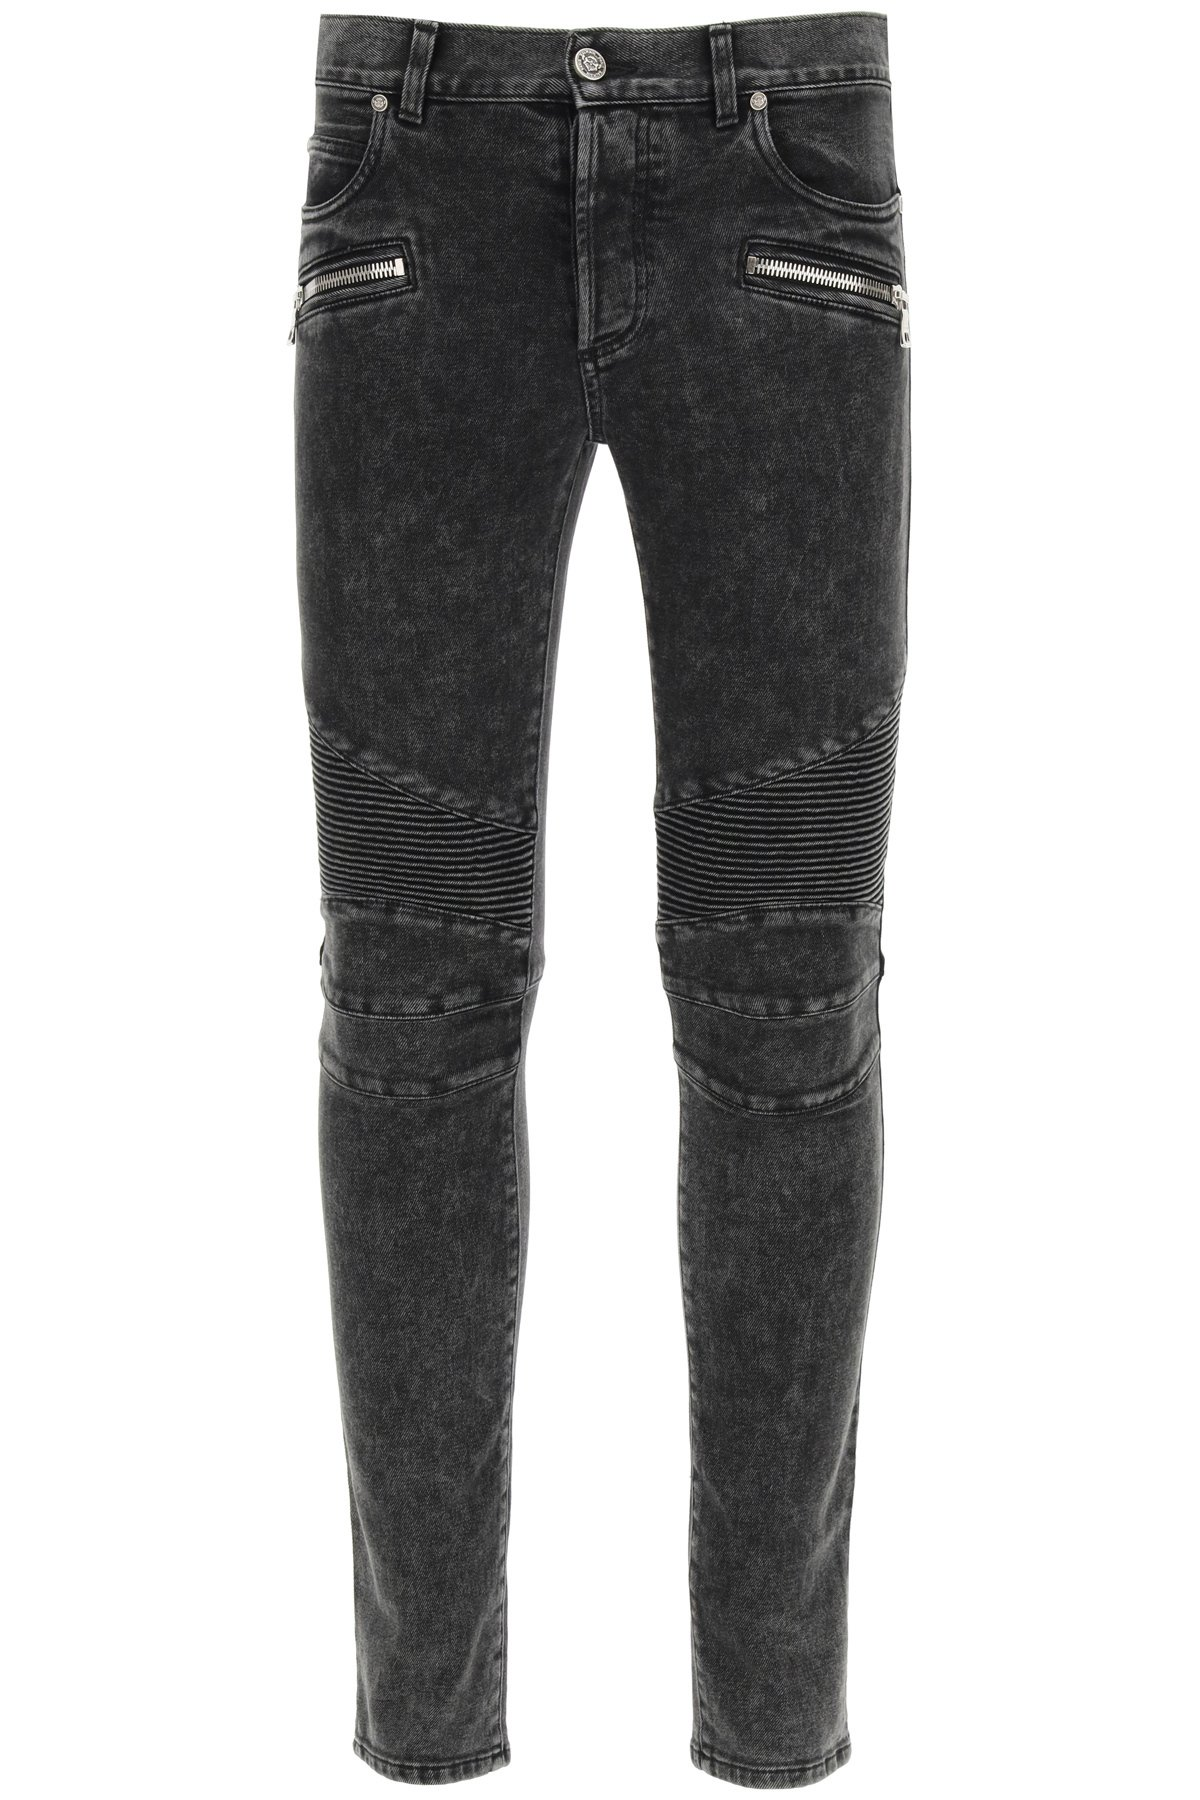 Balmain jeans biker slim